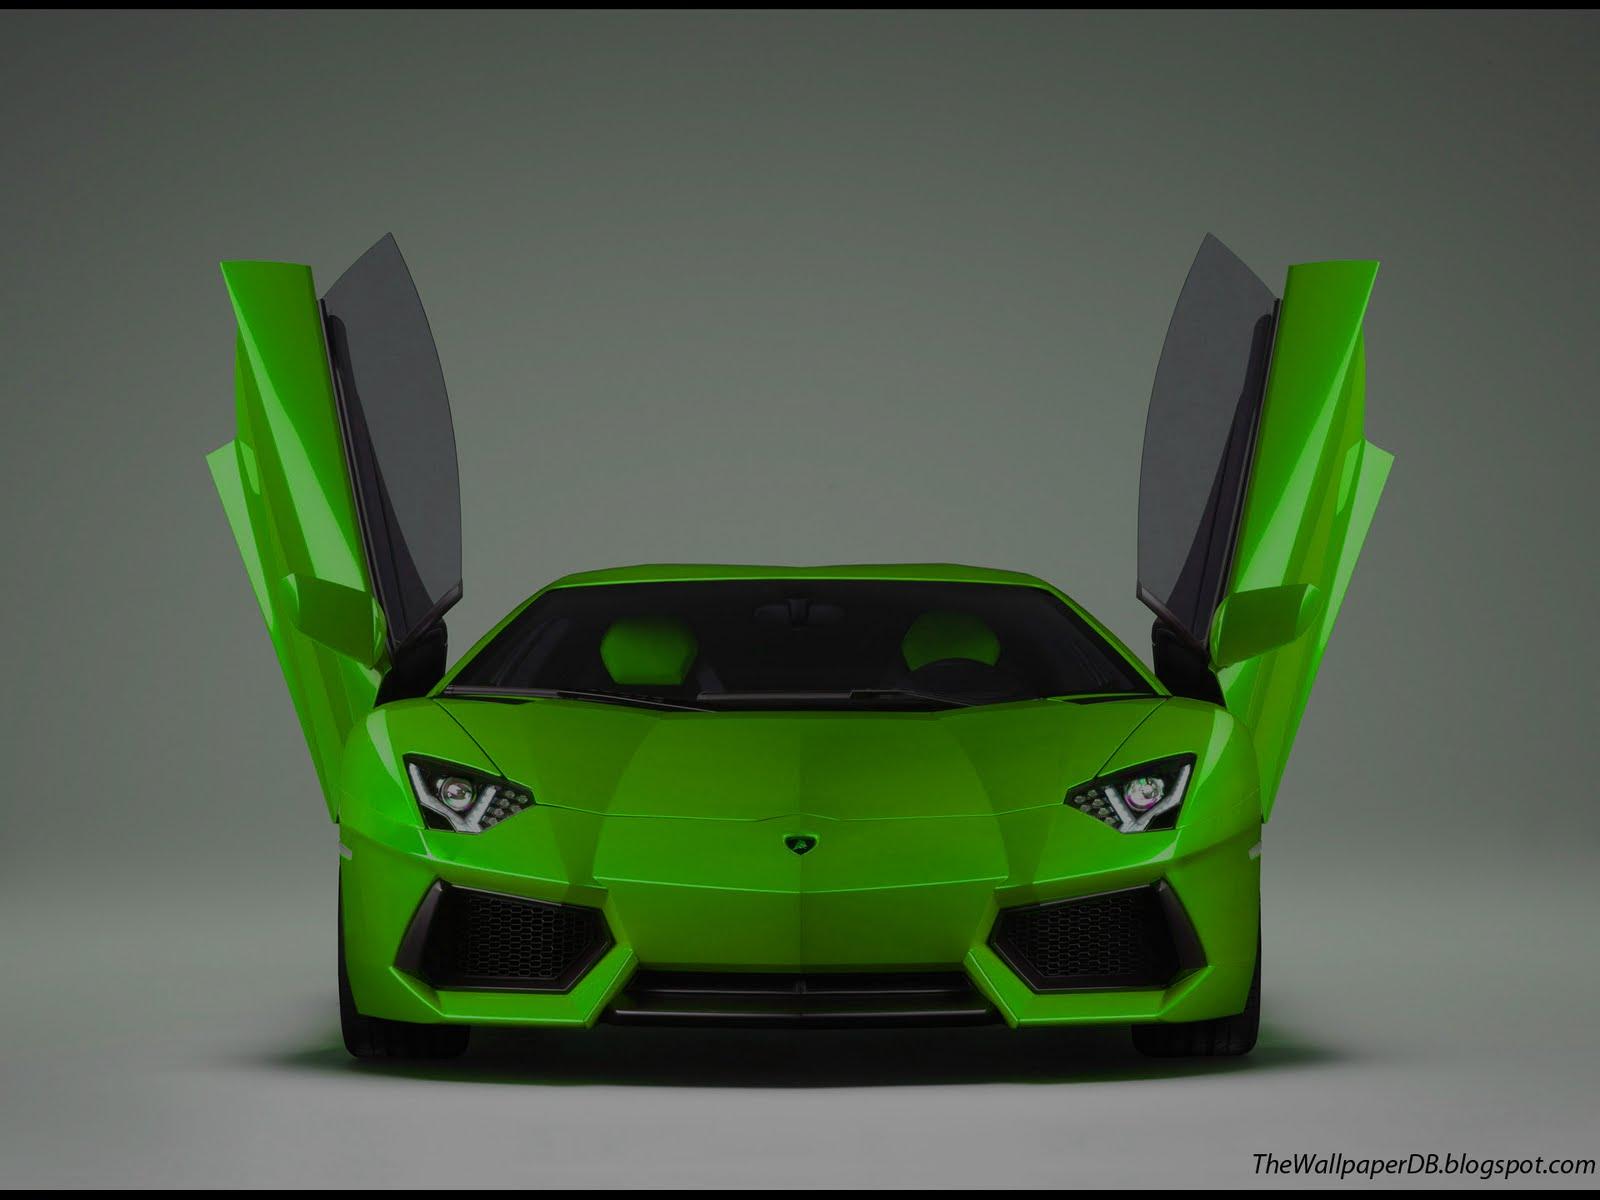 Lime Green Lamborghini Aventador